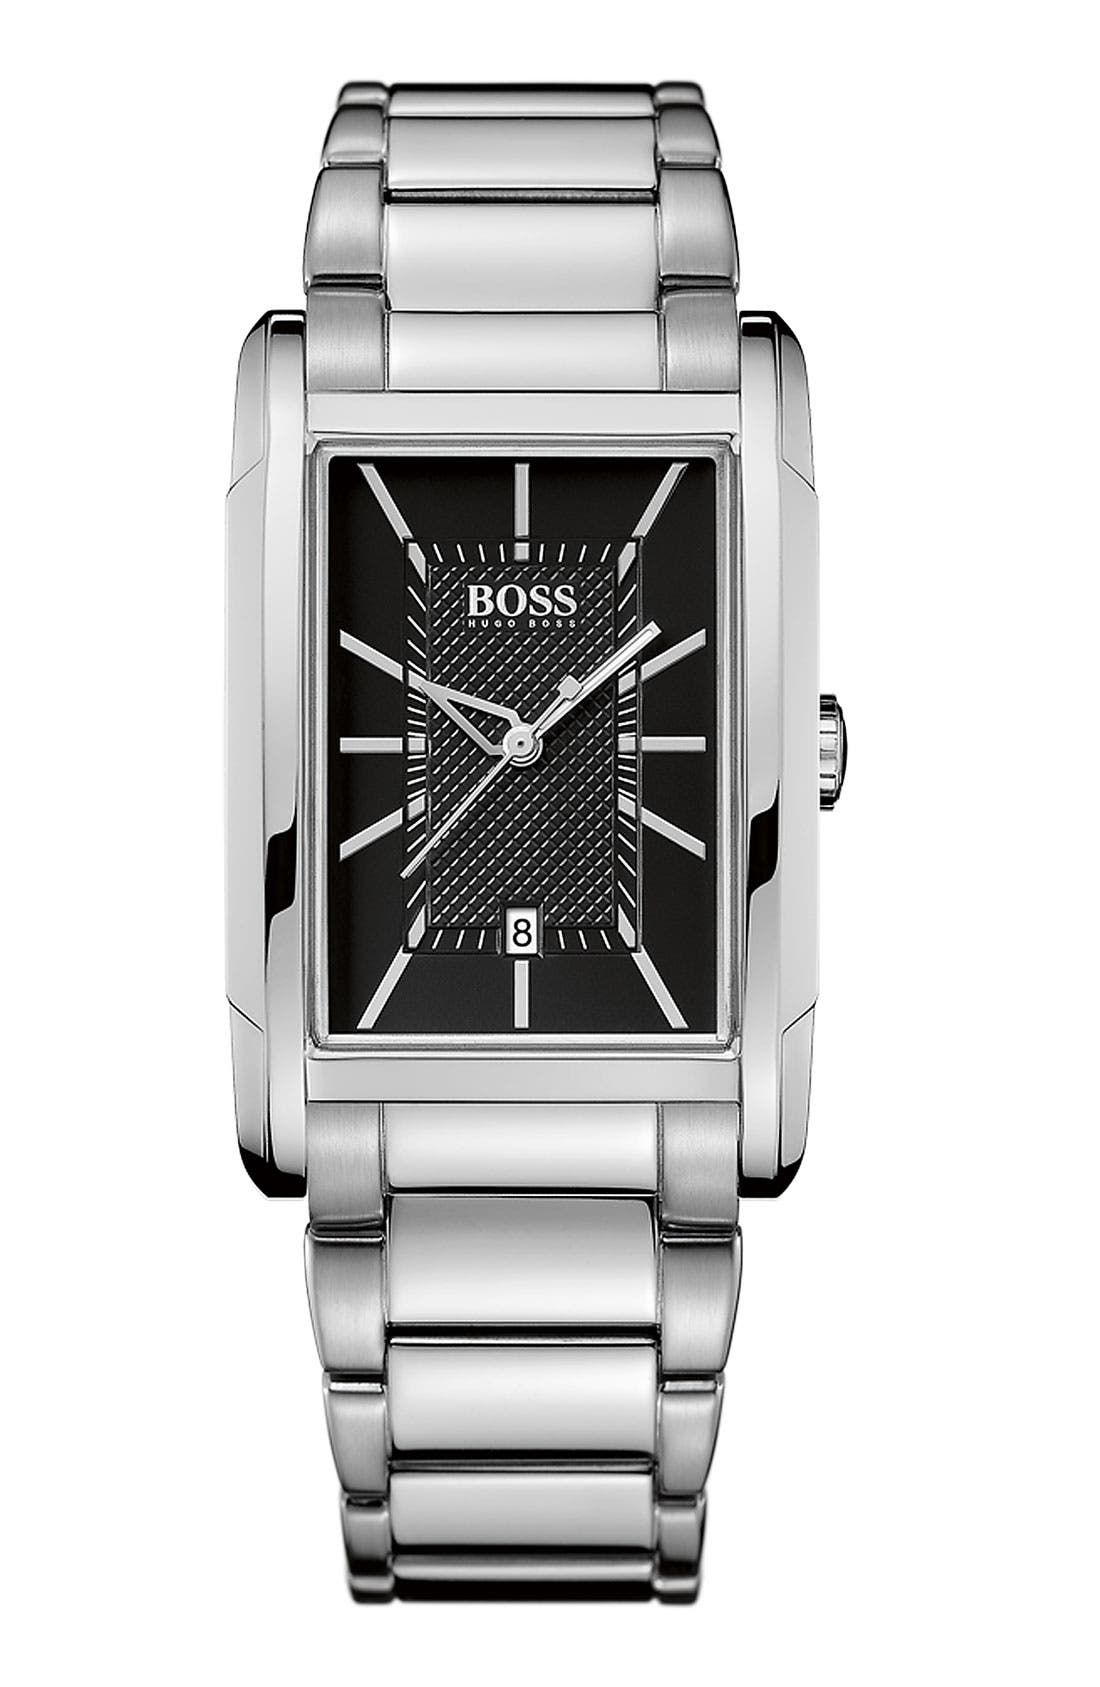 Main Image - BOSS HUGO BOSS Large Rectangular Black Dial Watch, 30mm x 36mm